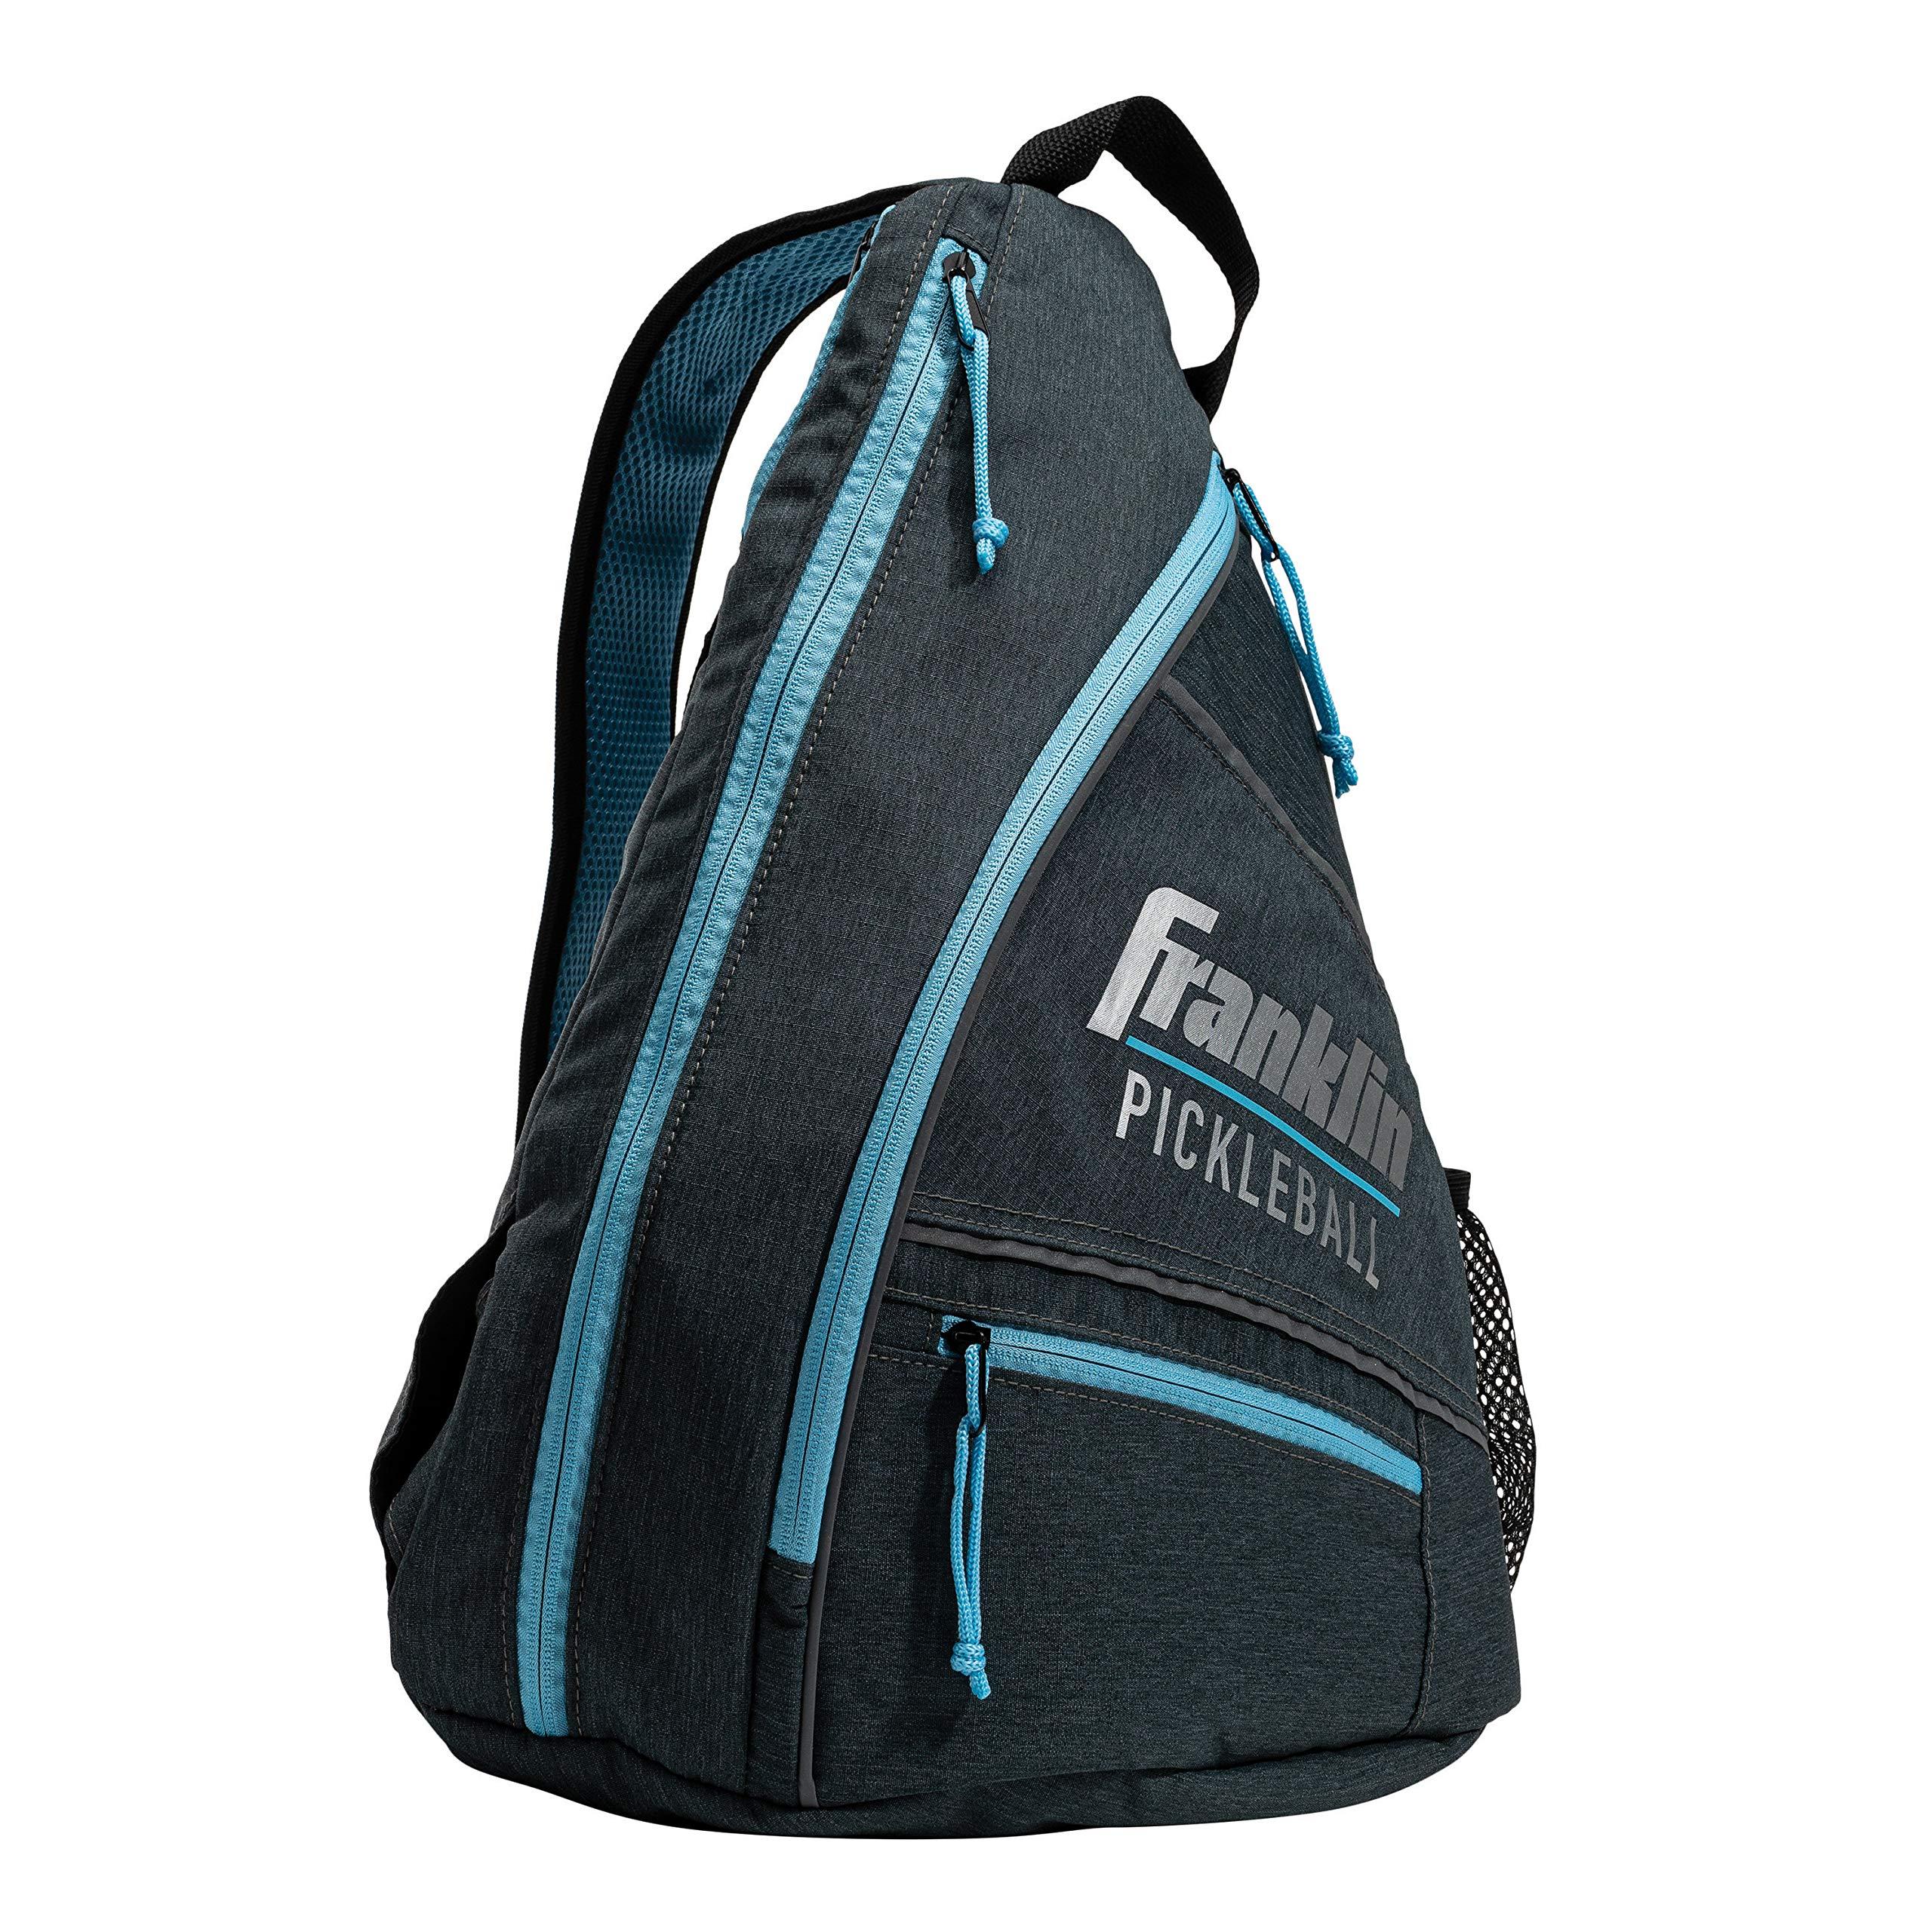 Franklin Sports Pickleball Sling Bag - Official Pickleball Bag of The U.S. Open Pickleball Championships - Adjustable - Gray/Blue by Franklin Sports